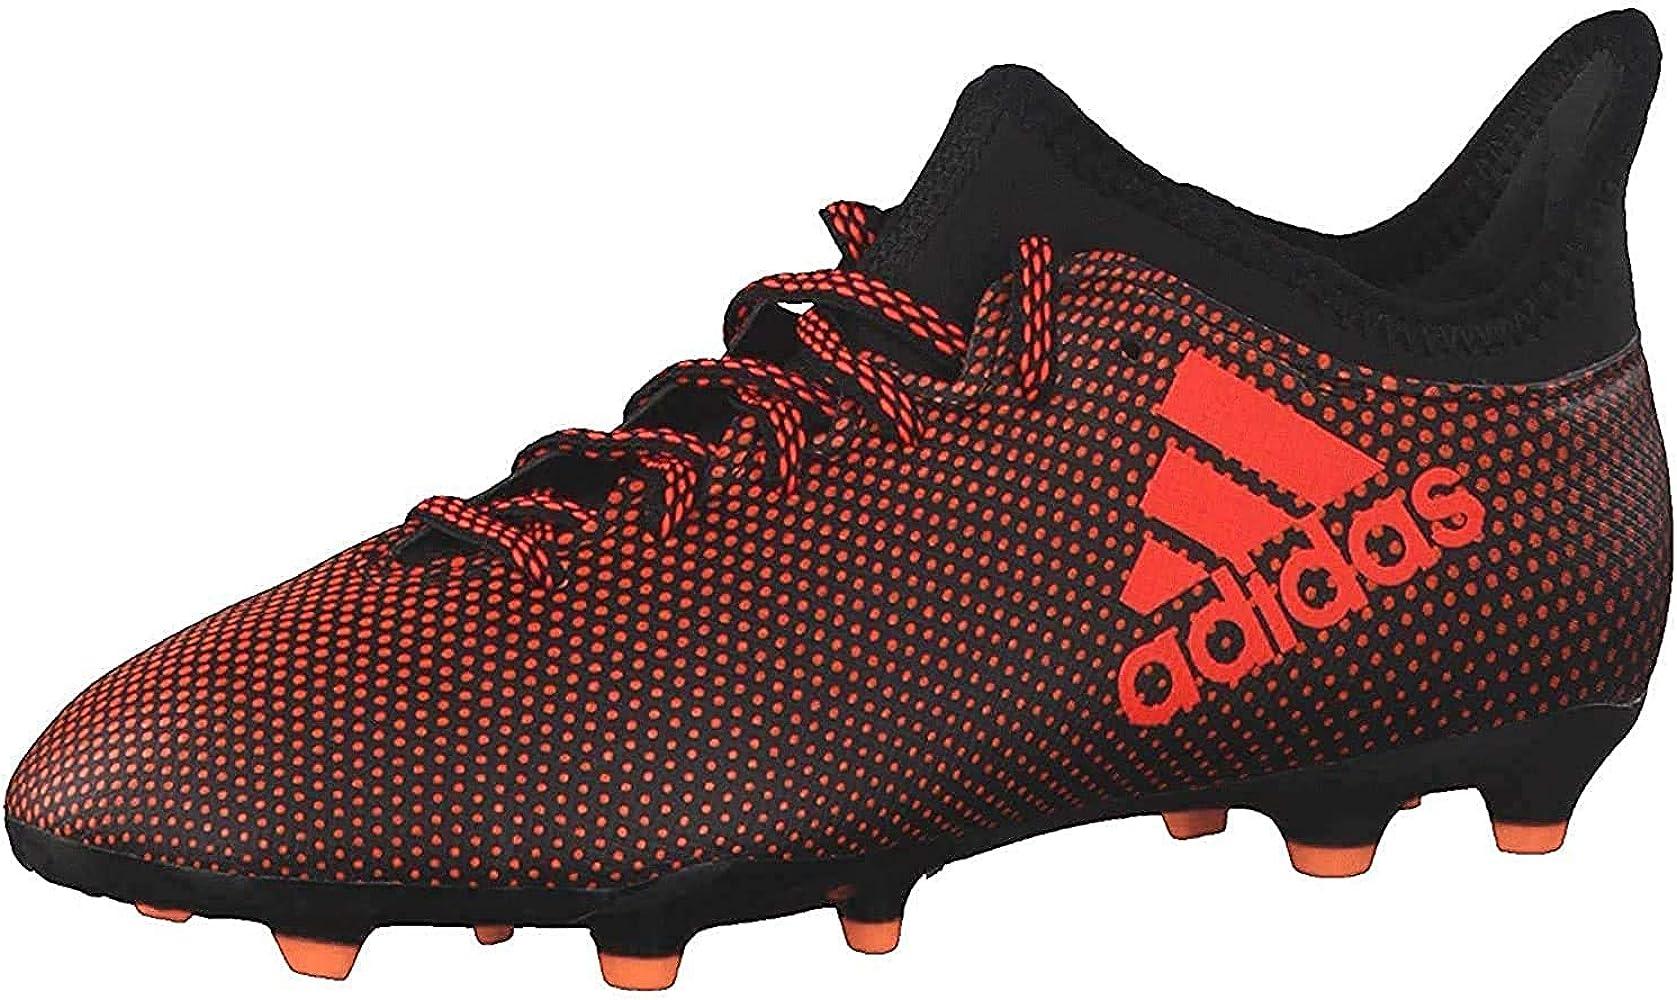 adidas X 17.3 FG Football Boots - Youth